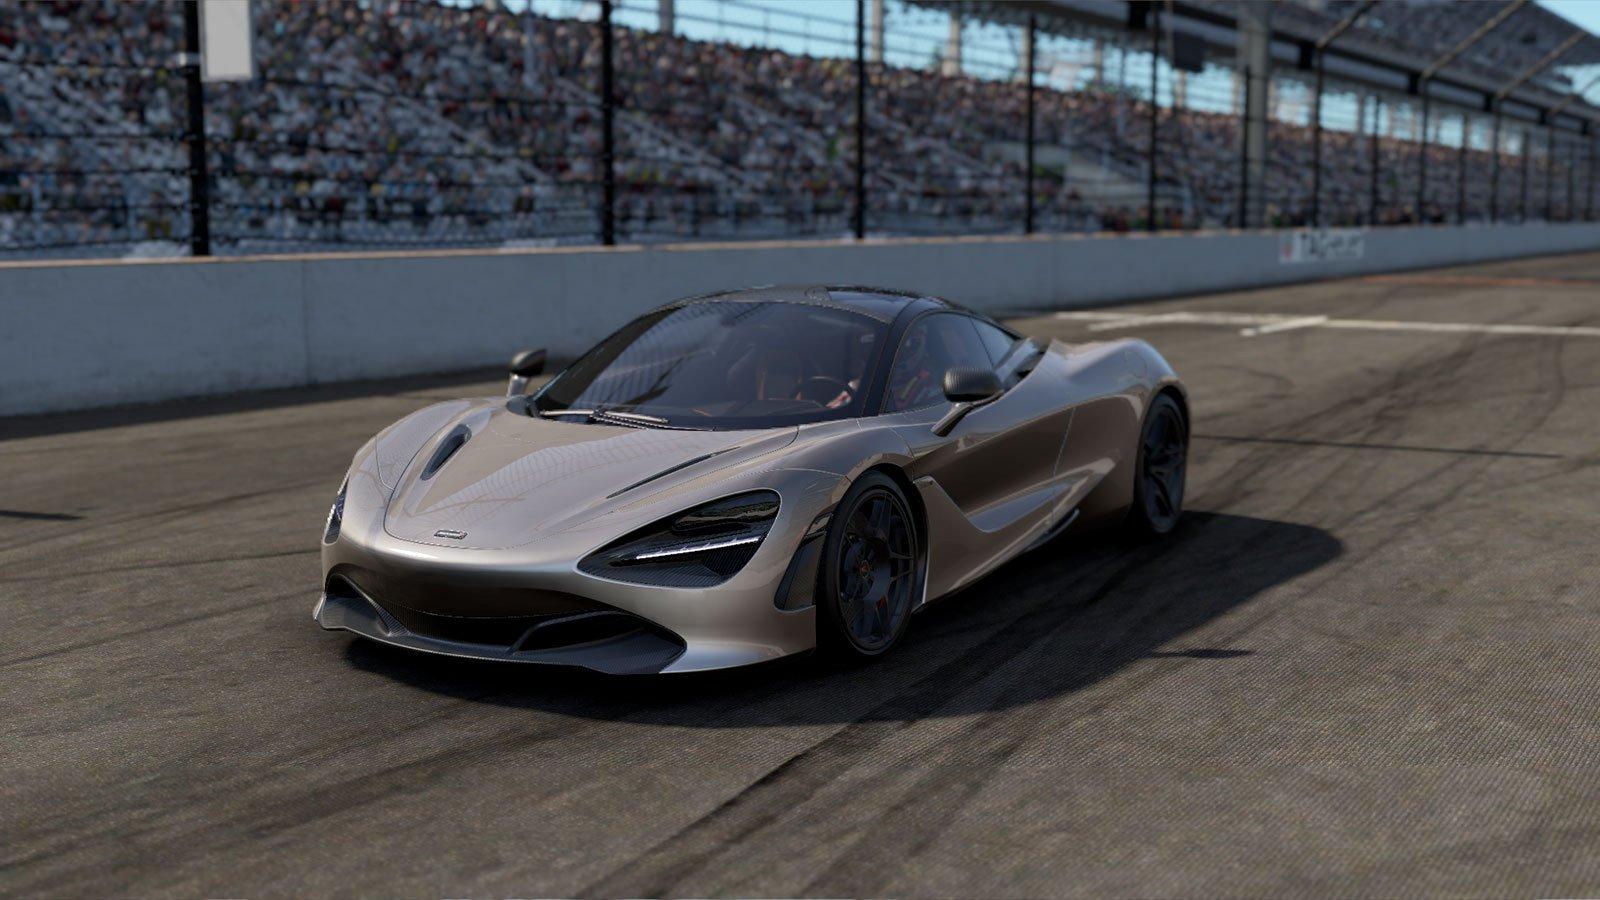 Project Cars 2 Screenshot 2017.09.21 01.40.27